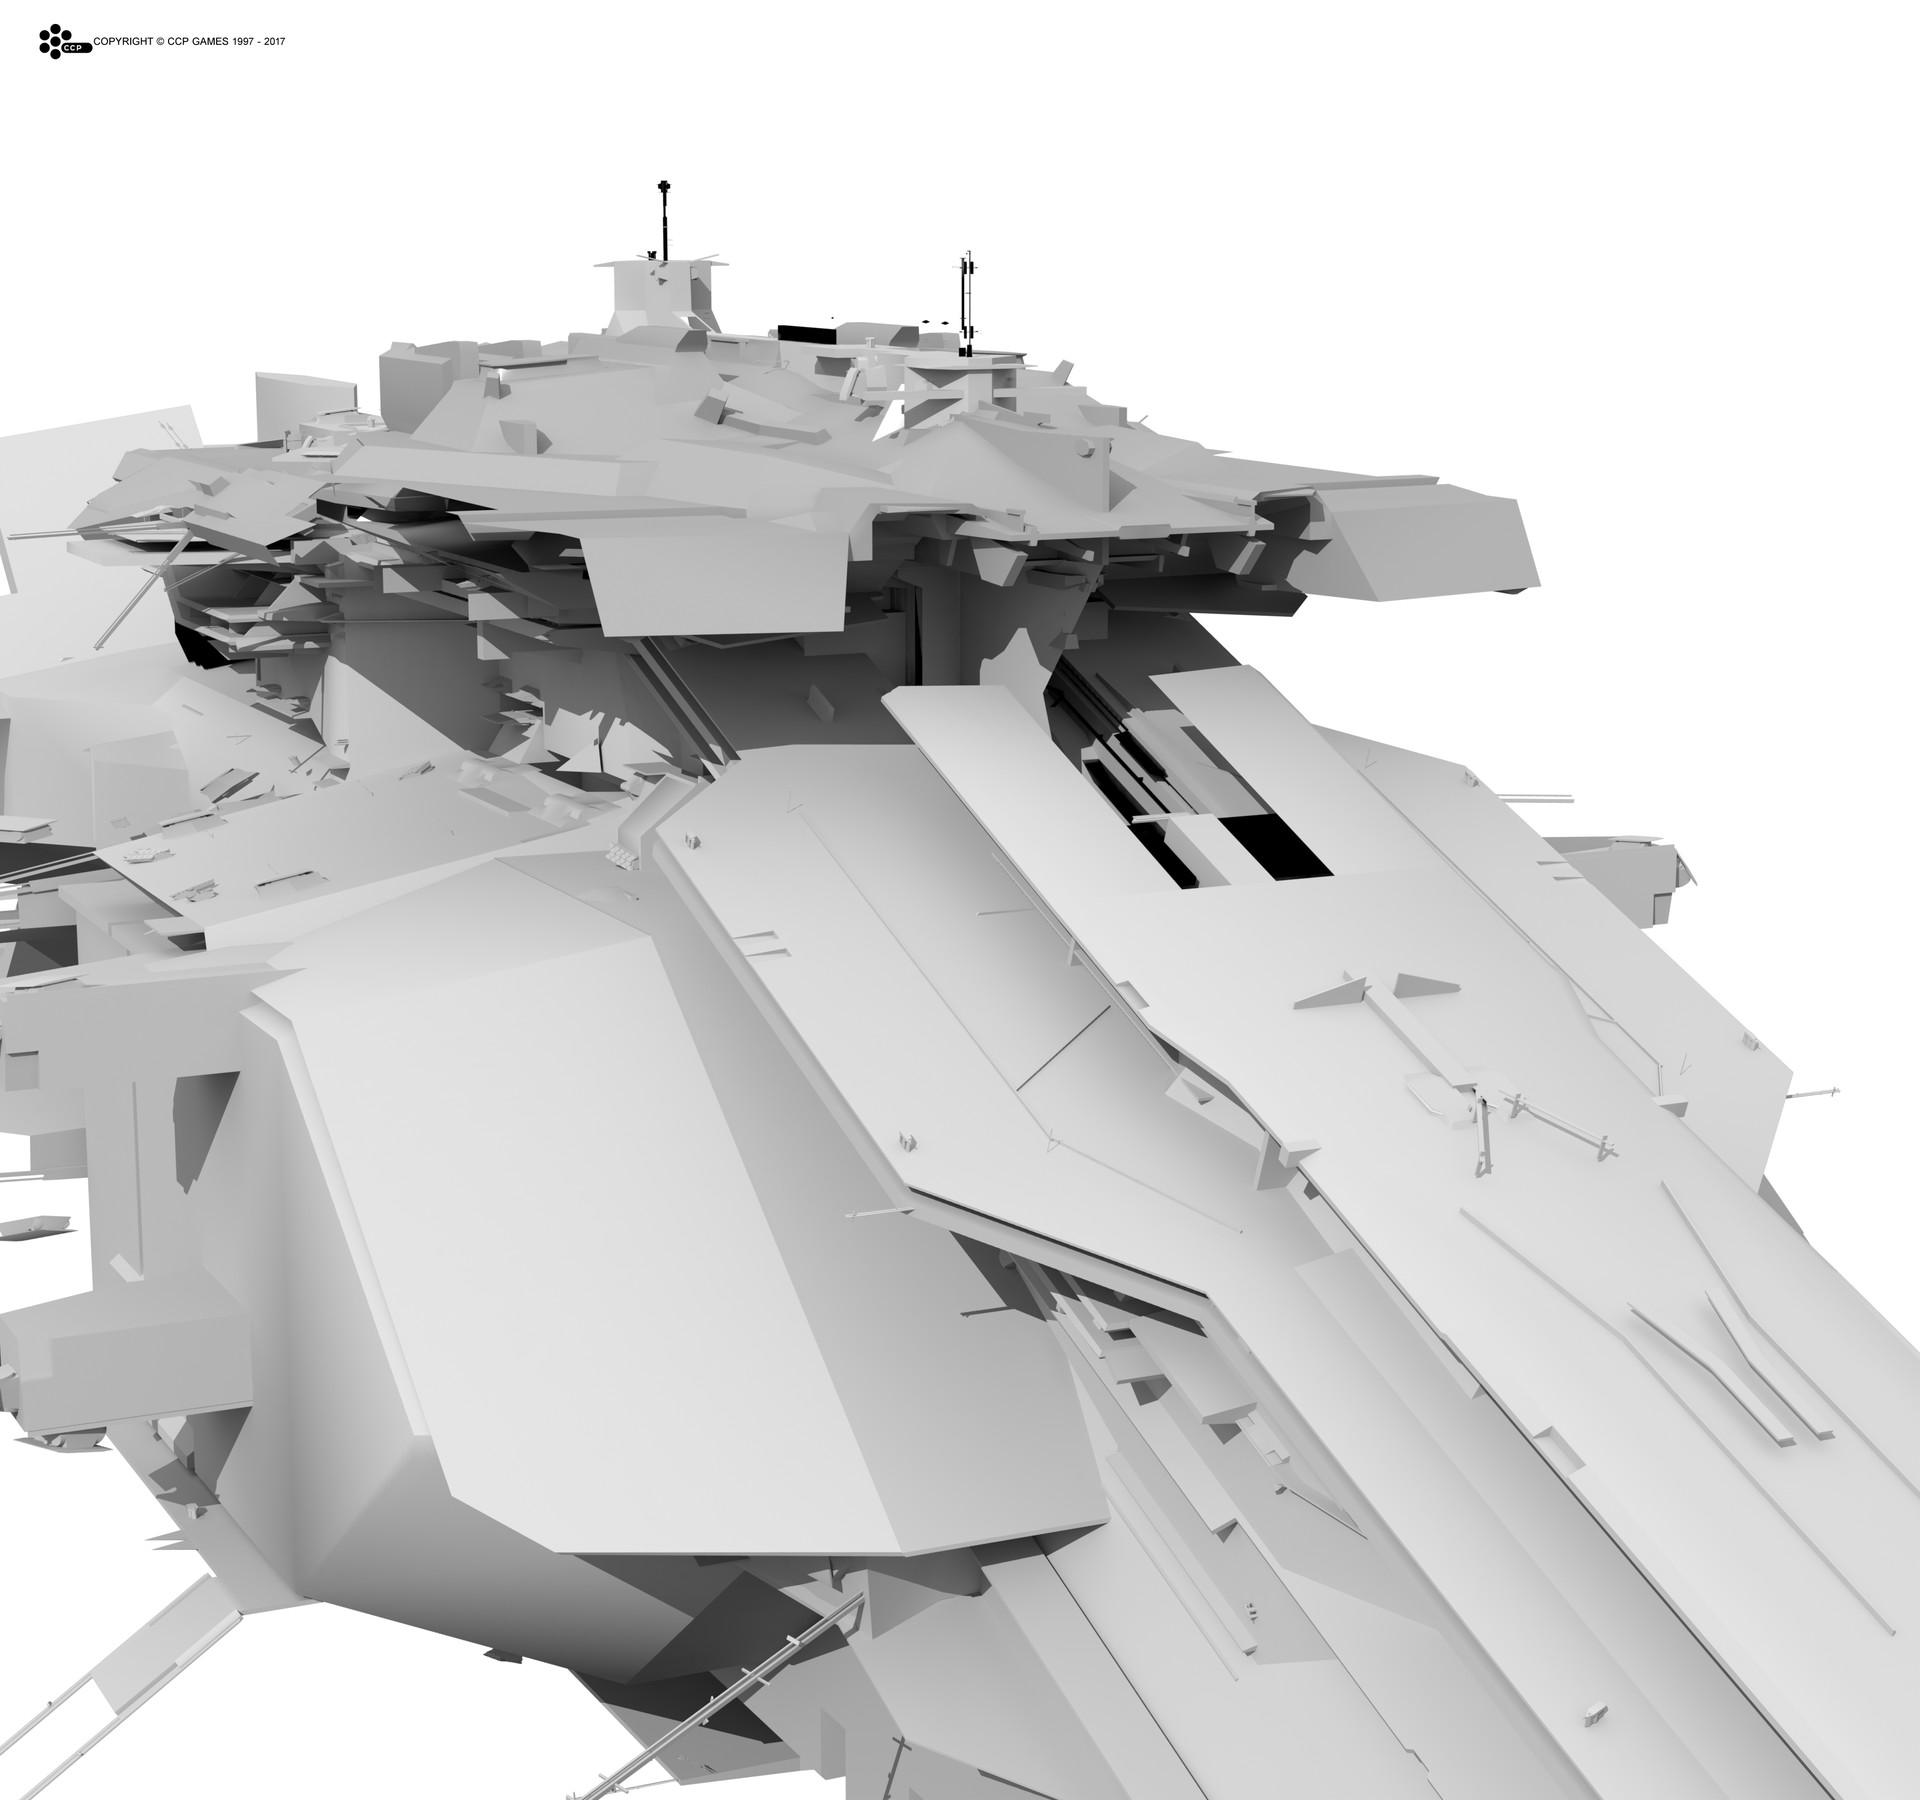 ArtStation - Unused Caldari Capital ship, Kasim Lewis